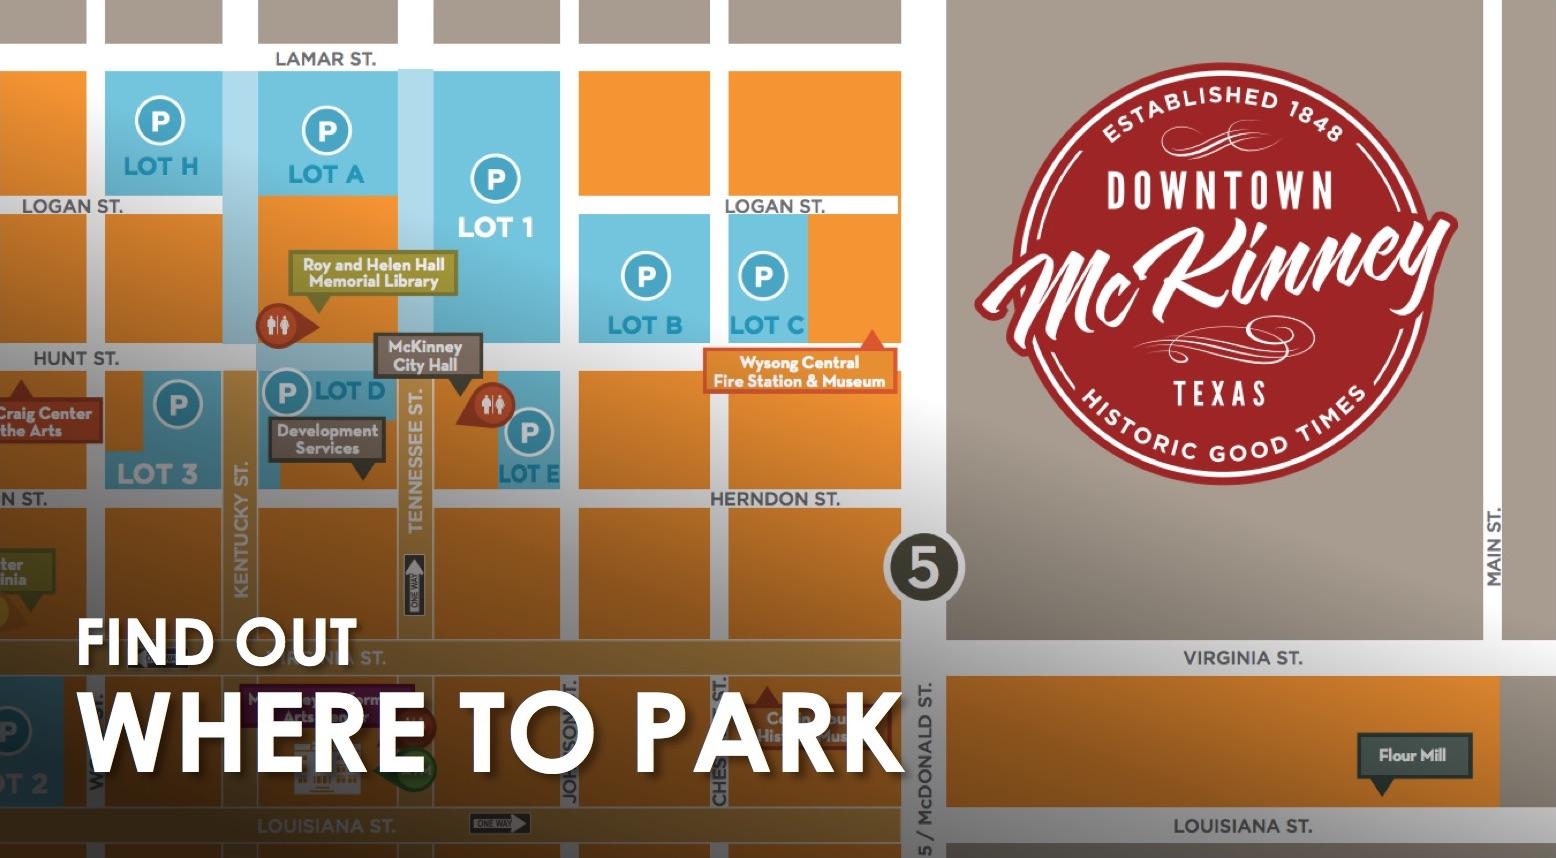 Downtown-McKinney-Texas-Where-to-Park.jpg